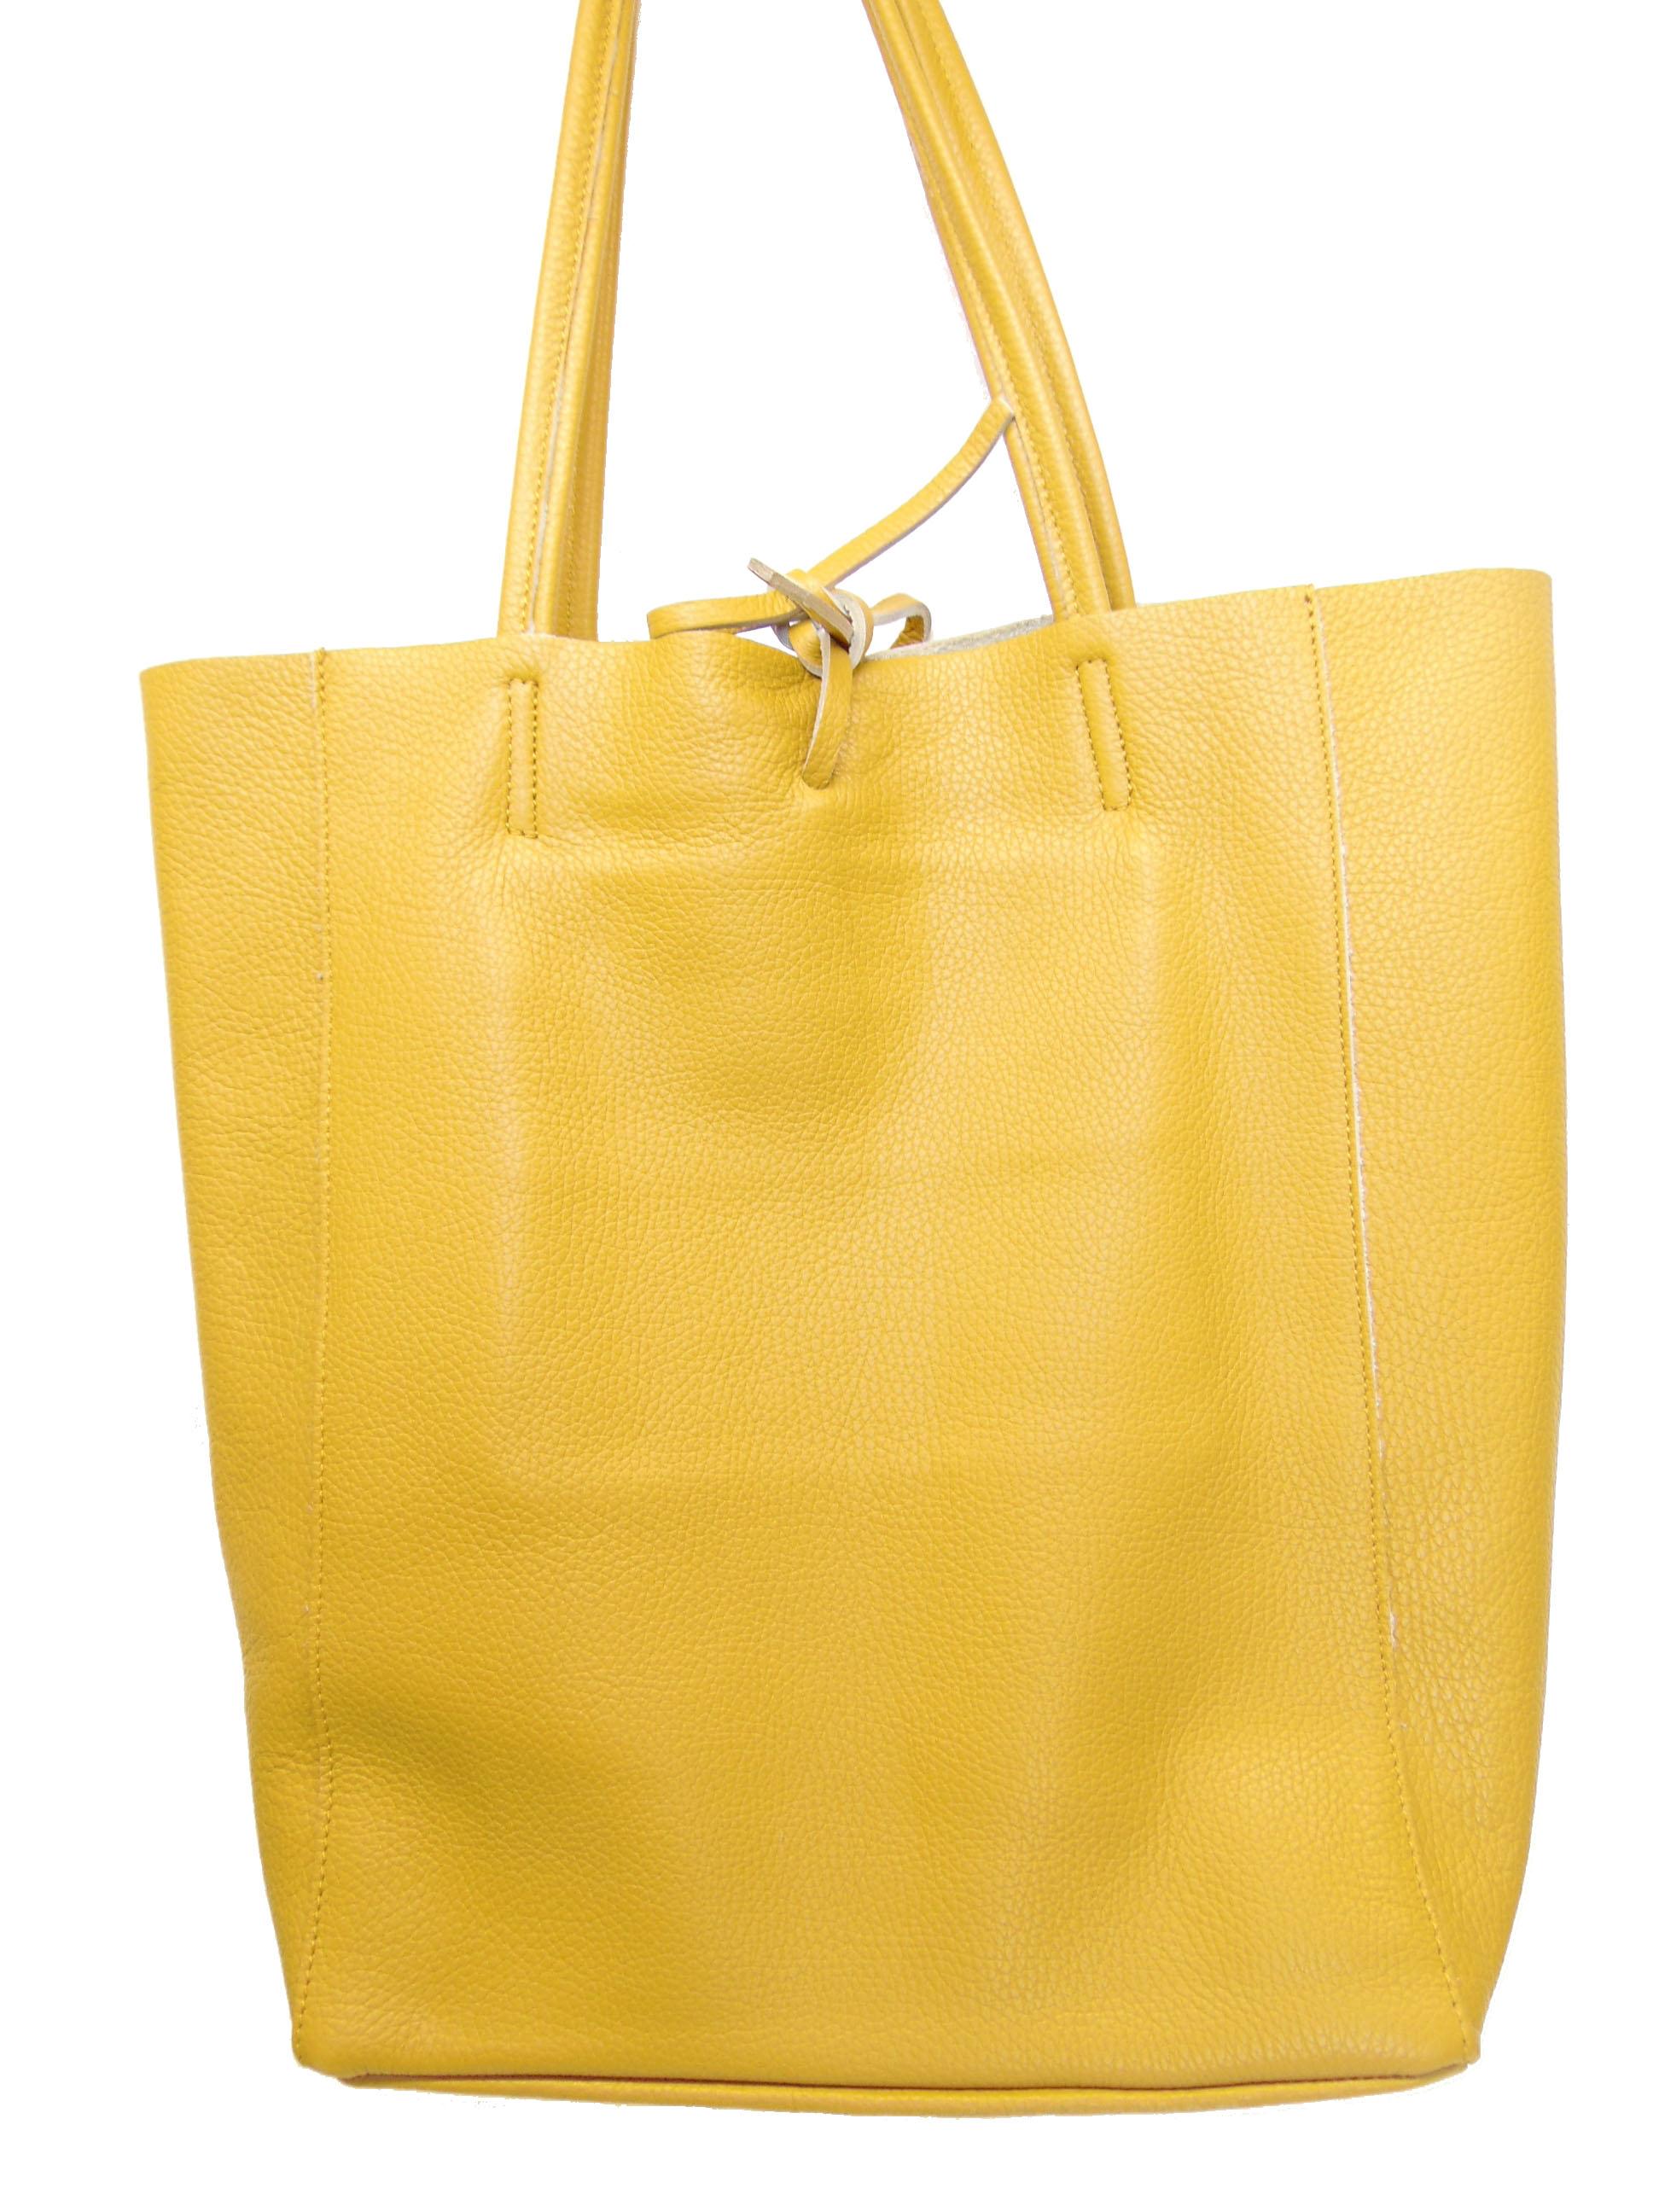 5b95b4c2a30d2 Skórzana żółta torebka